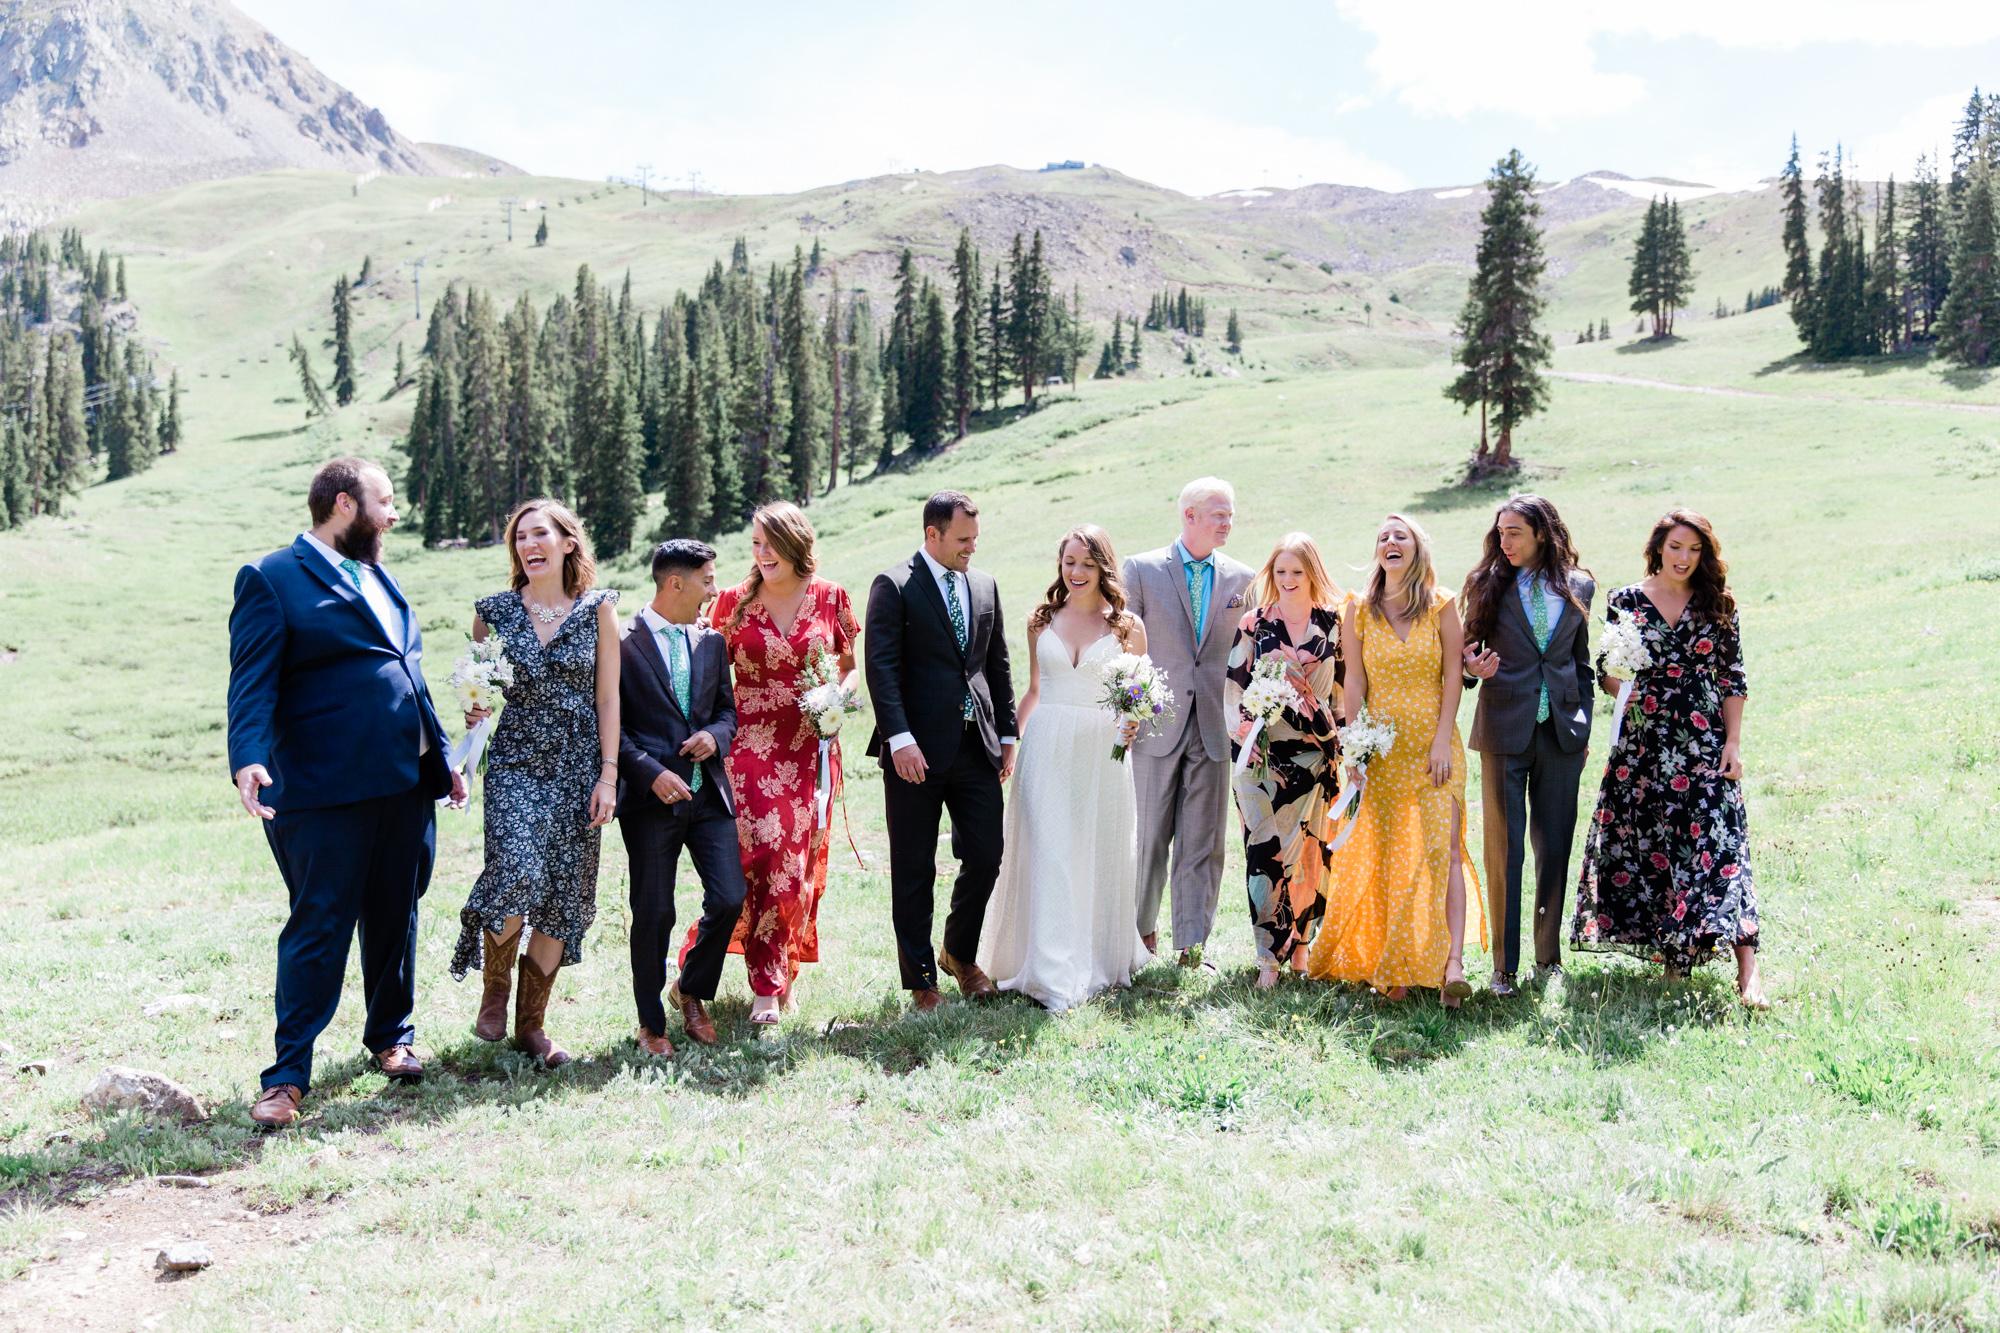 2019-08-09-Wedding-Kate-Hunter-ArapahoeBasin-1641.jpg